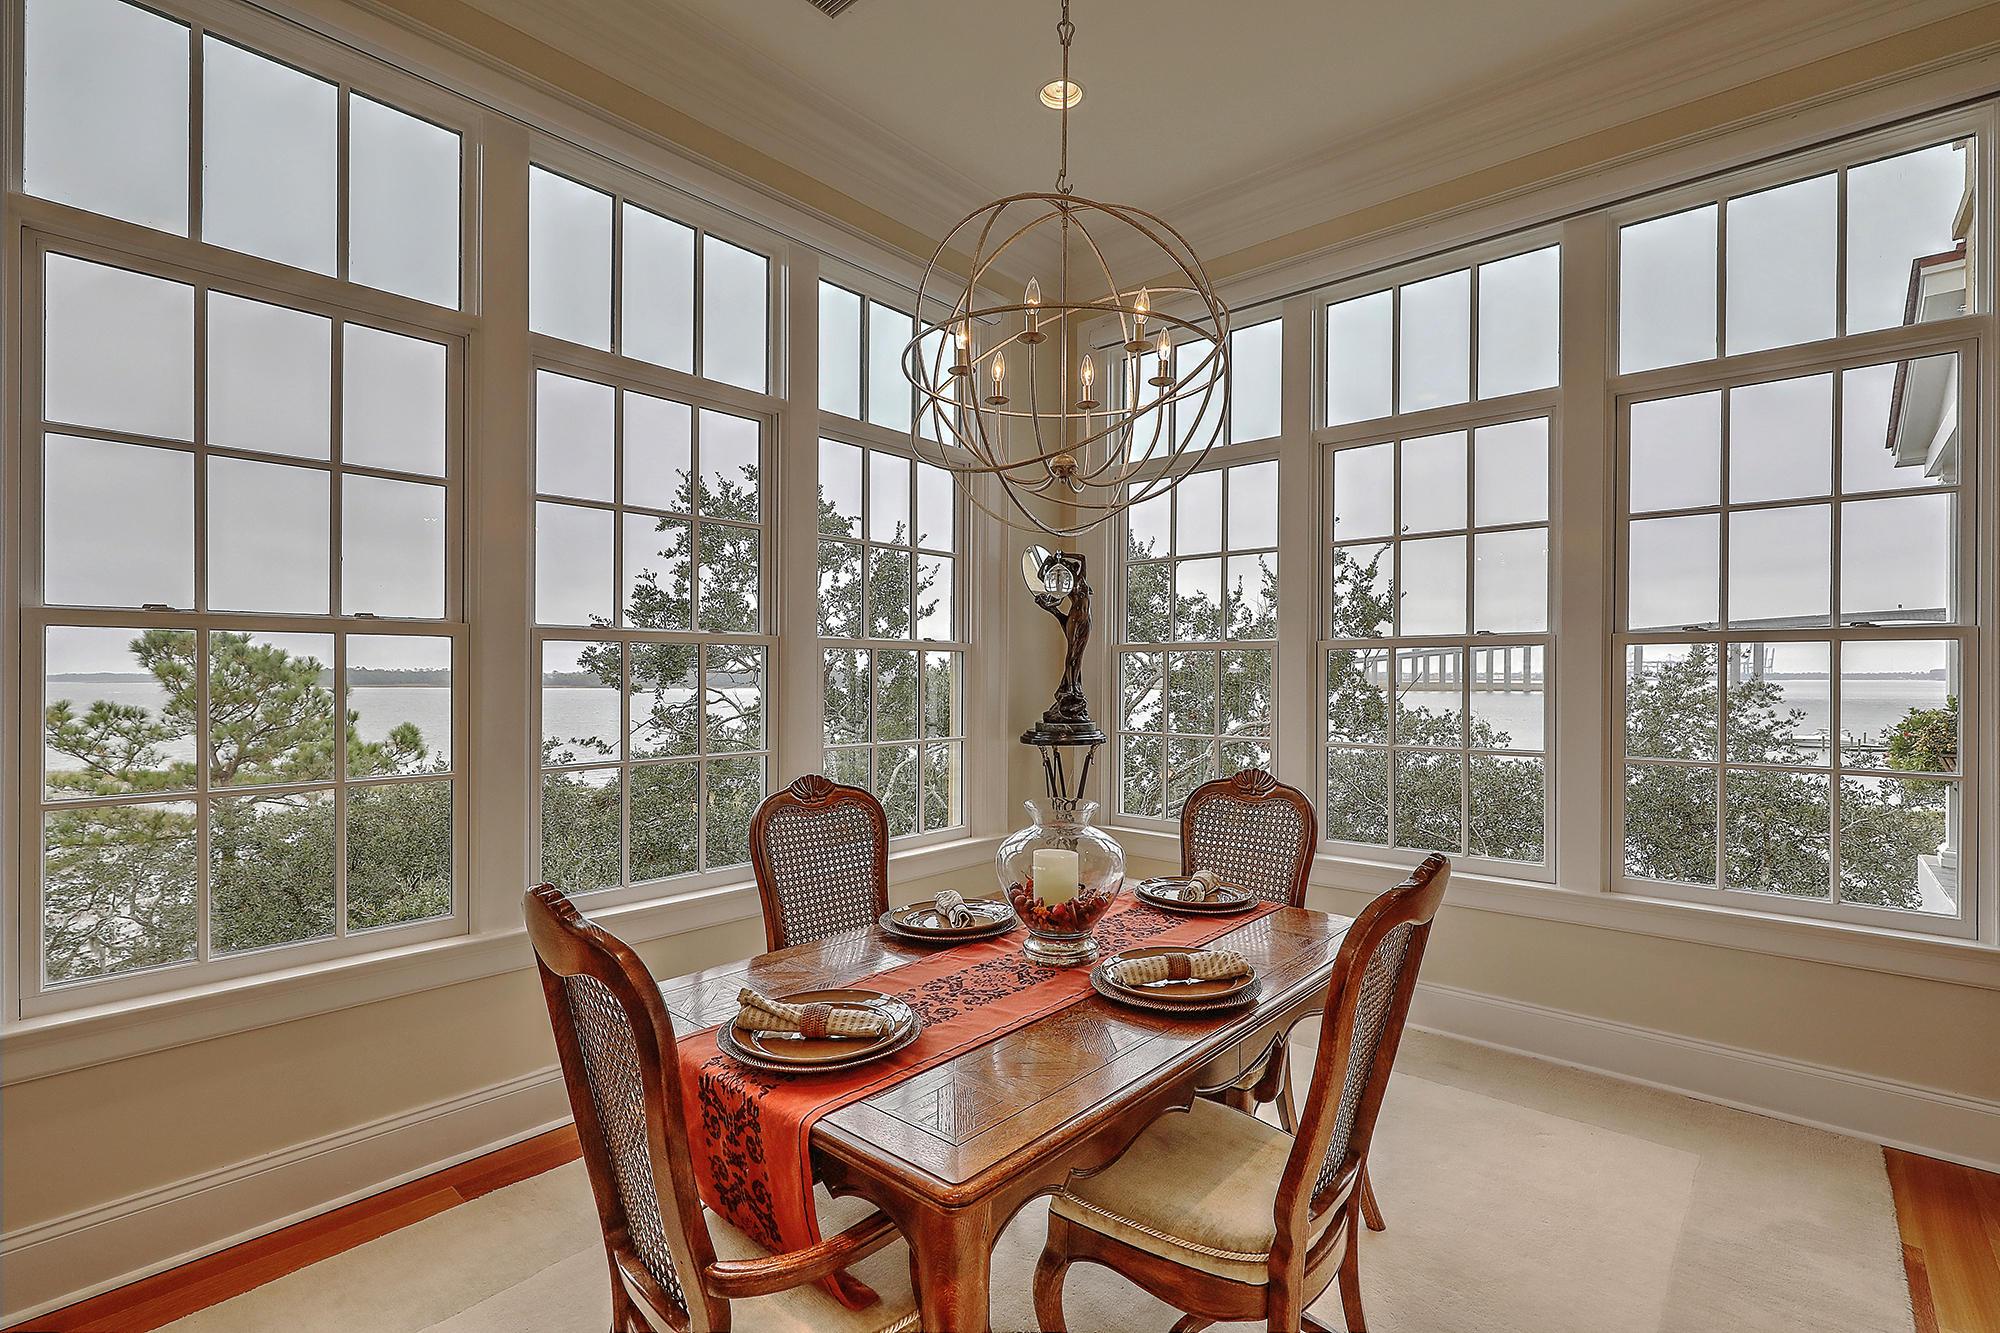 Daniel Island Park Homes For Sale - 134 Fairbanks Oak Allee, Charleston, SC - 6